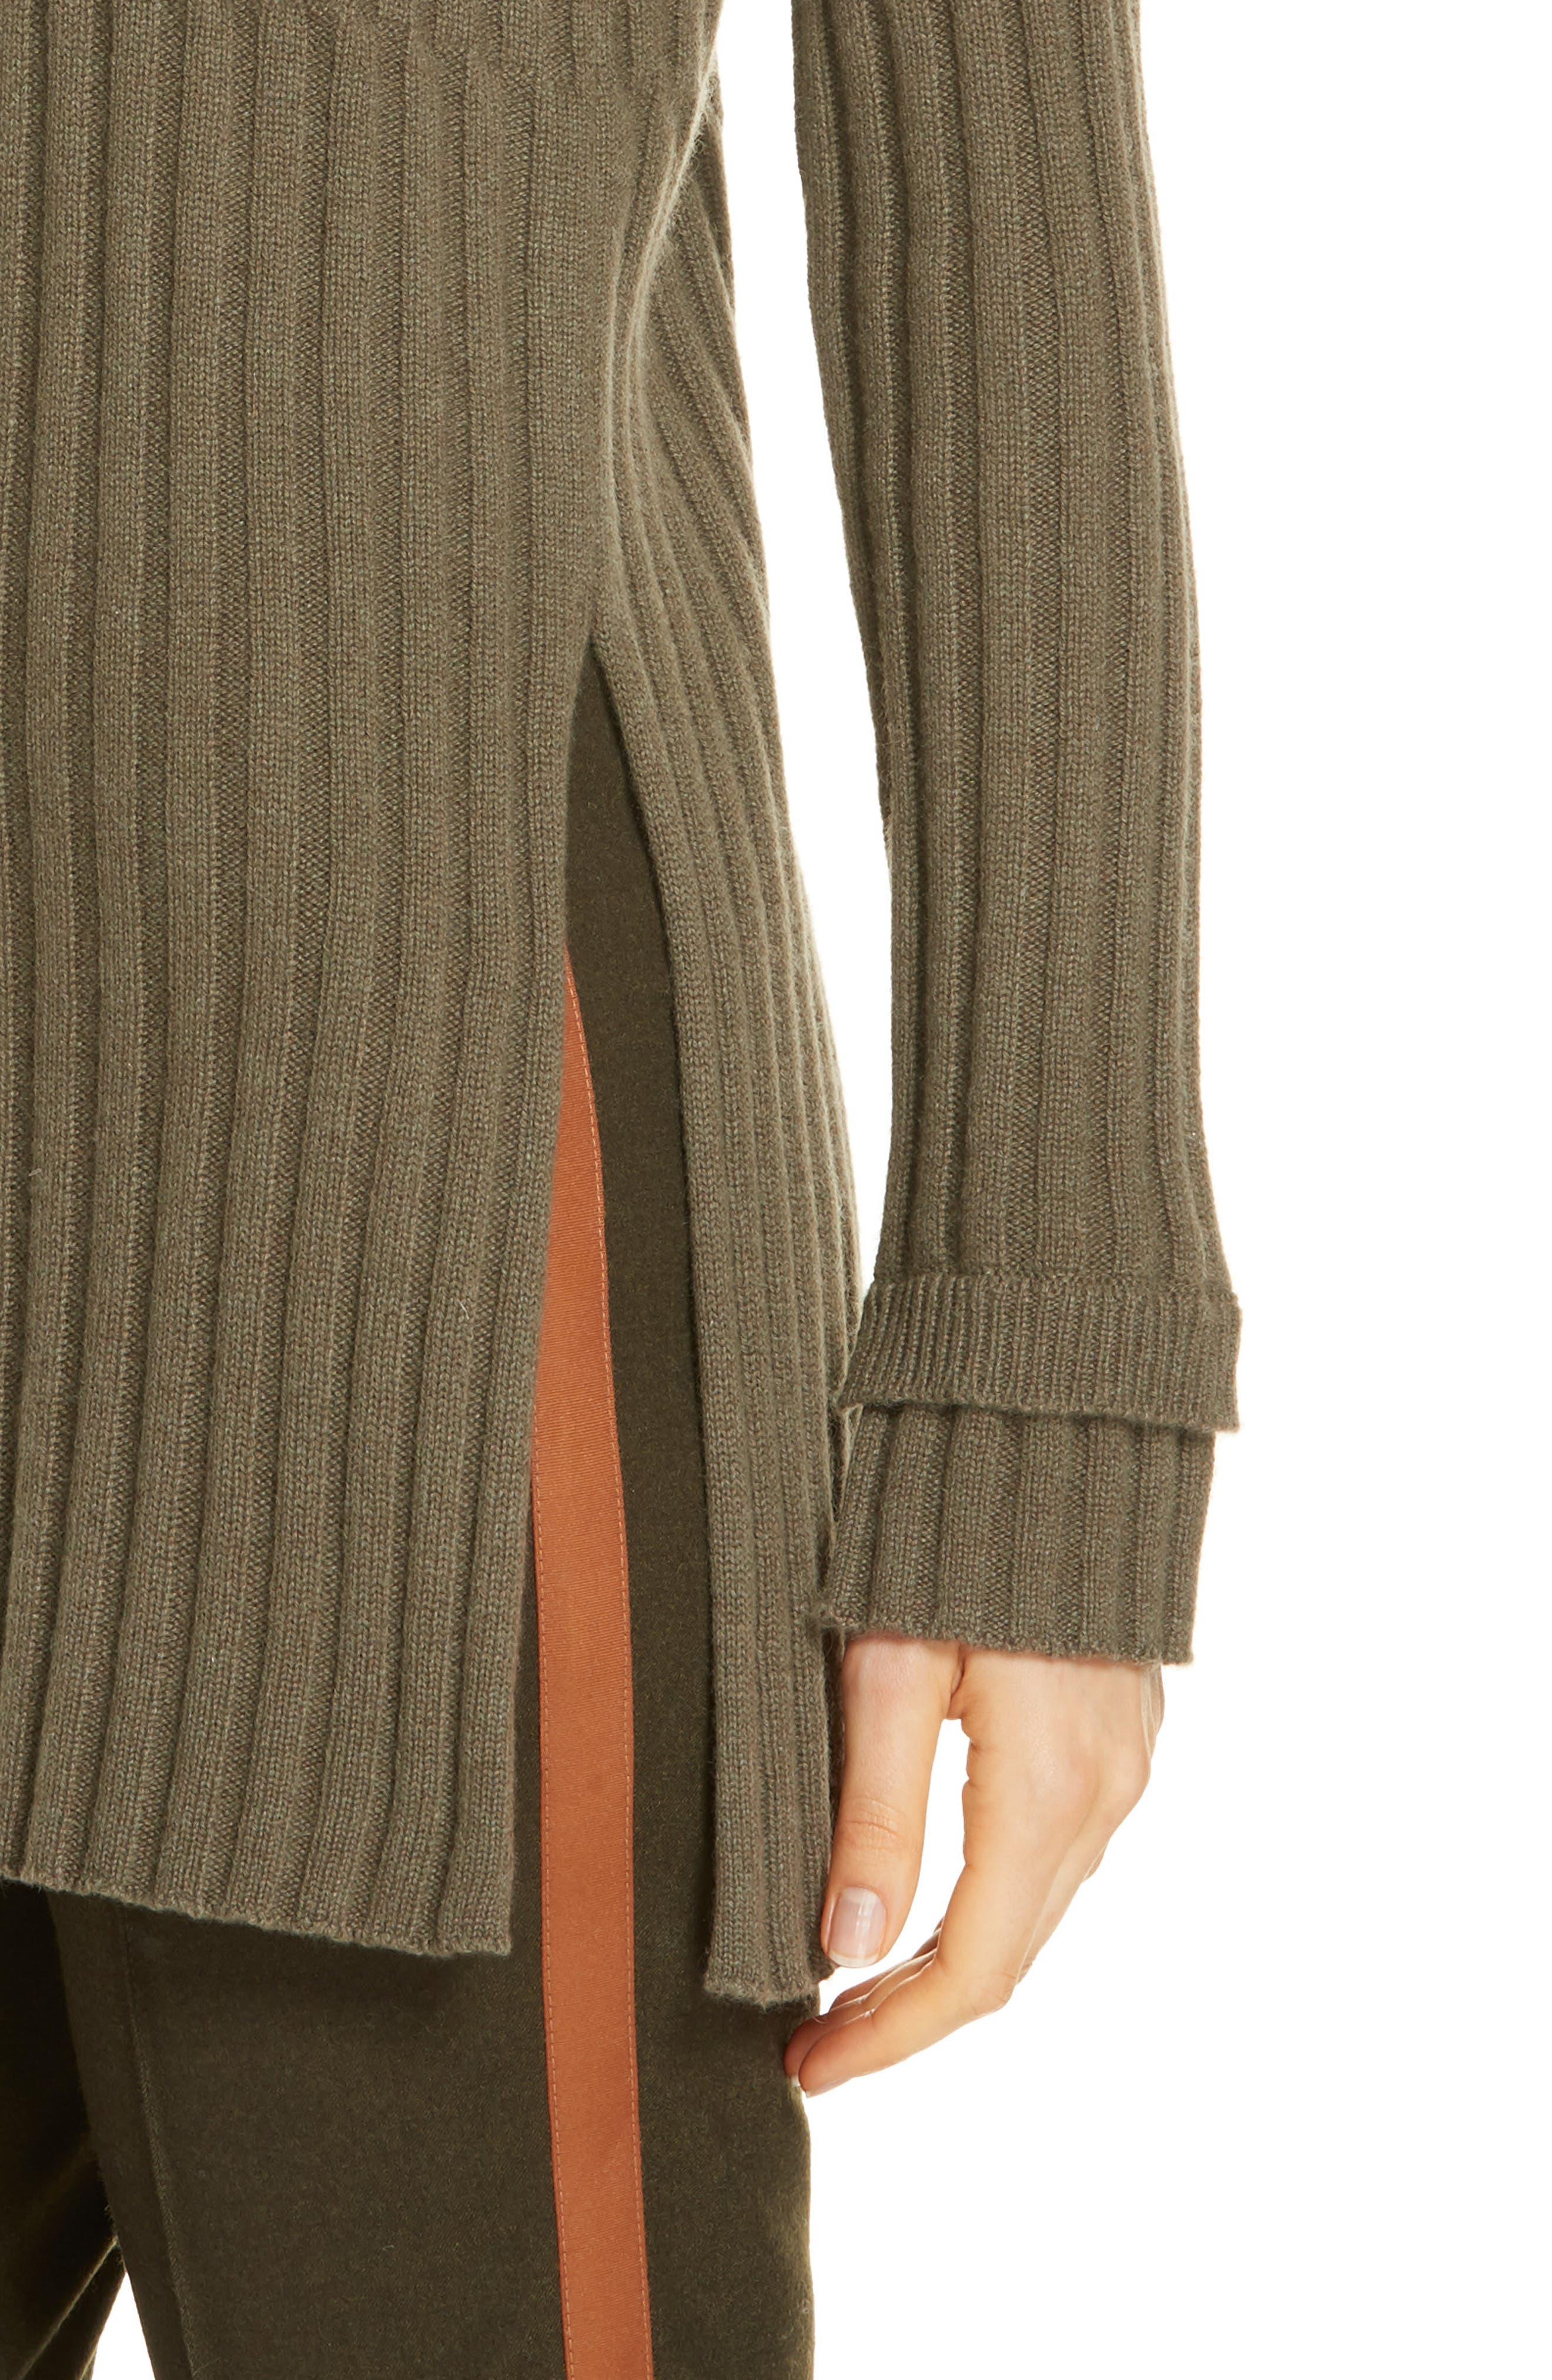 Rib Knit Cashmere Tunic,                             Alternate thumbnail 4, color,                             OLIVE IVY HEATHER